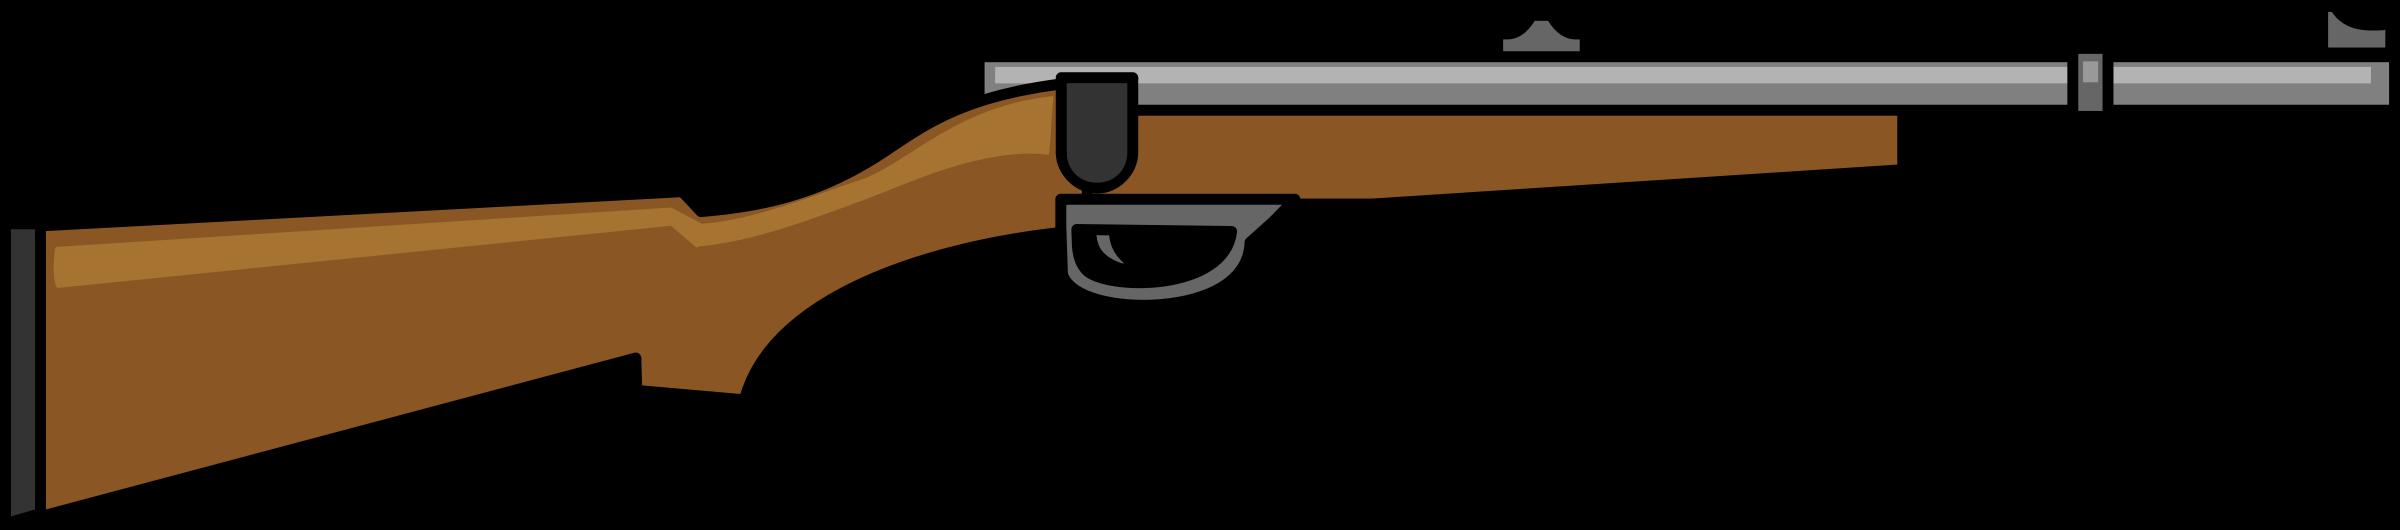 Gun12.png